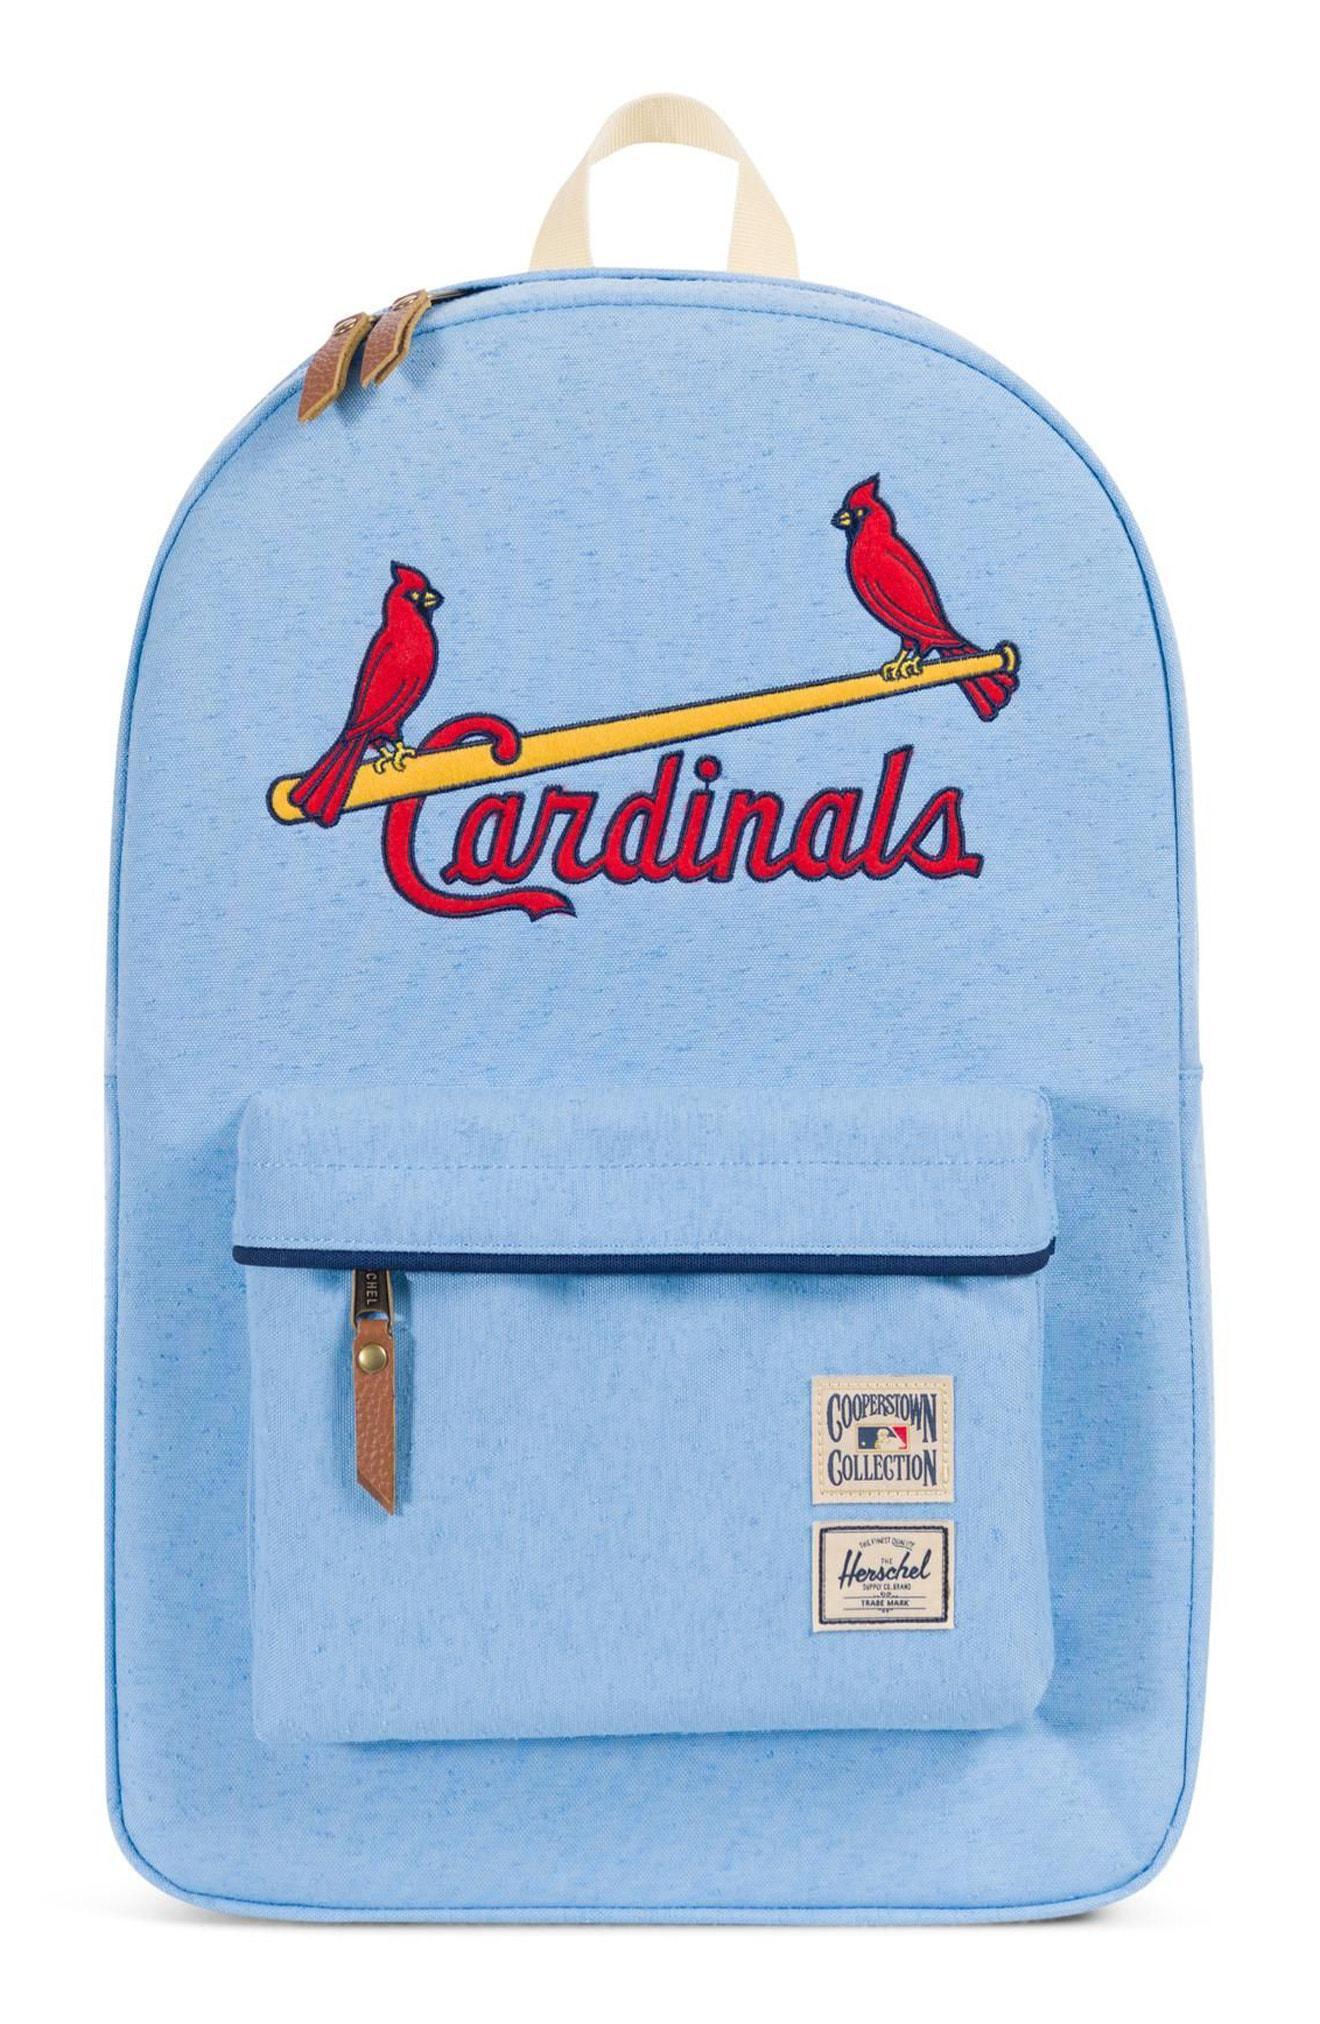 14b38cd0201d Herschel Supply Co. Men s Blue Heritage - Mlb Cooperstown Collection  Backpack